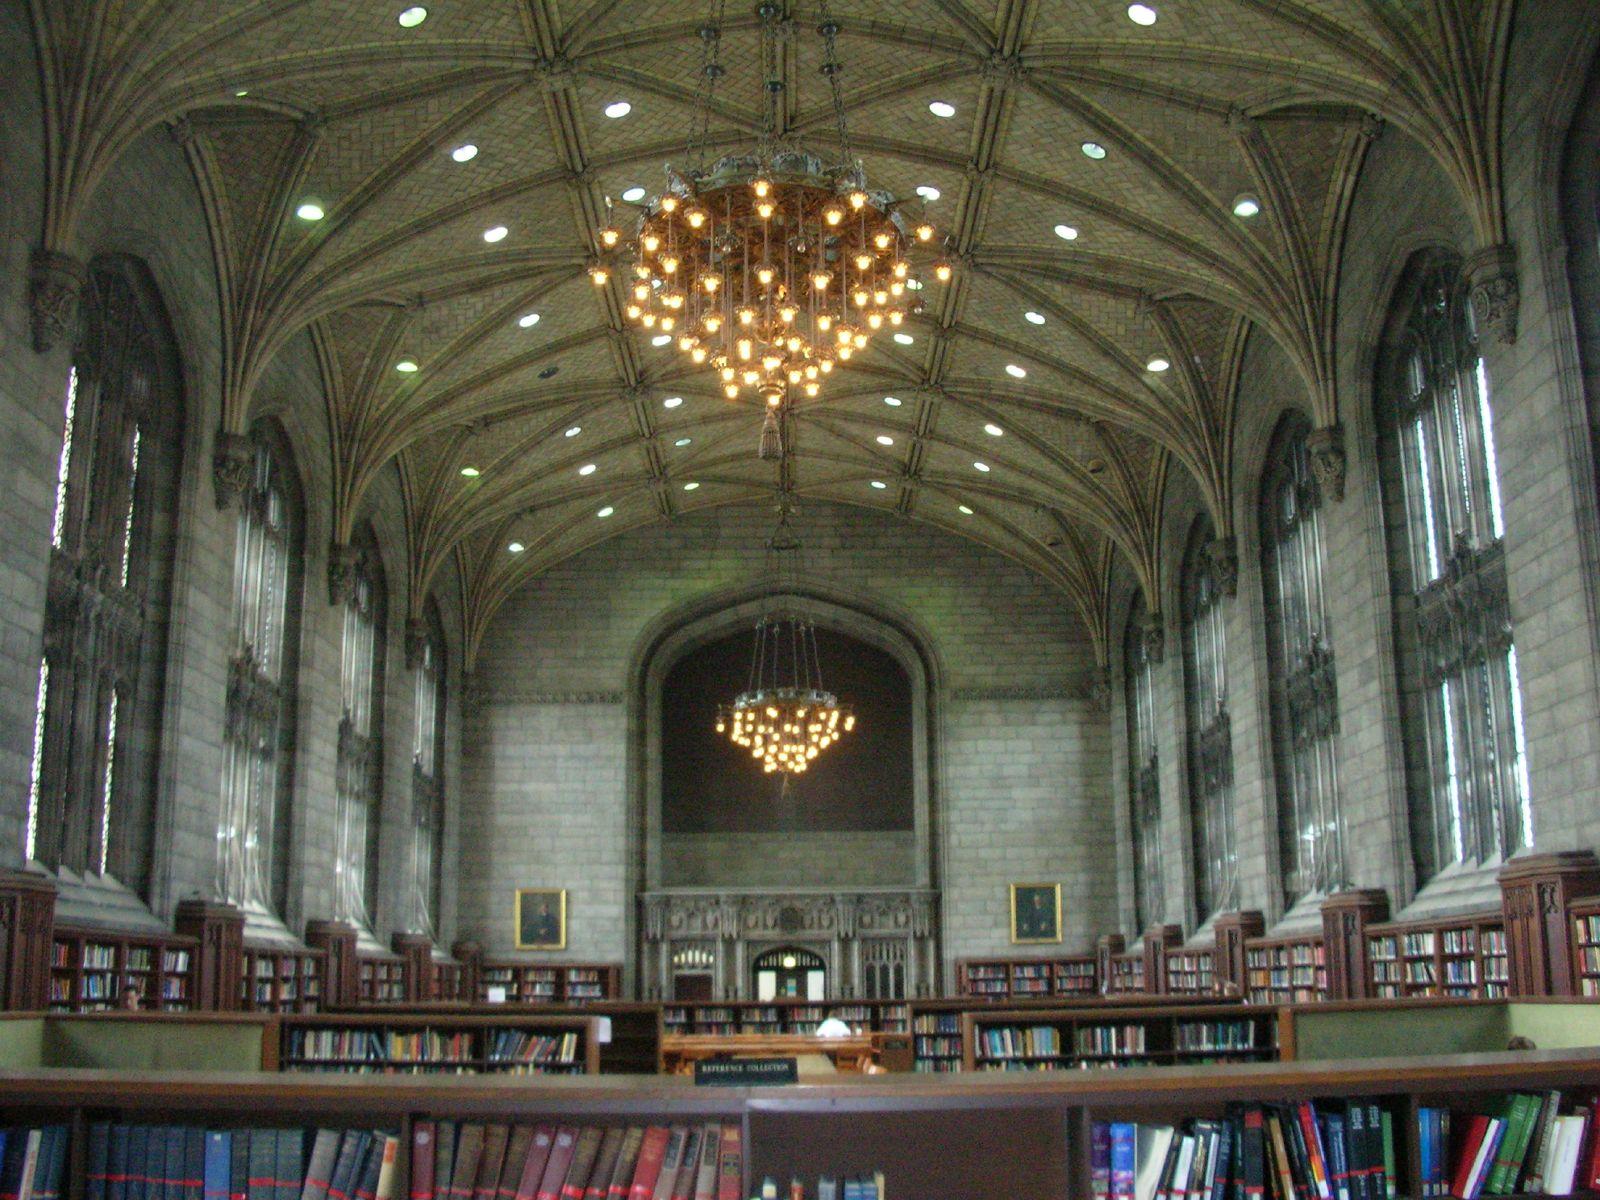 Harper_Library,_interior,_University_of_Chicago.jpg